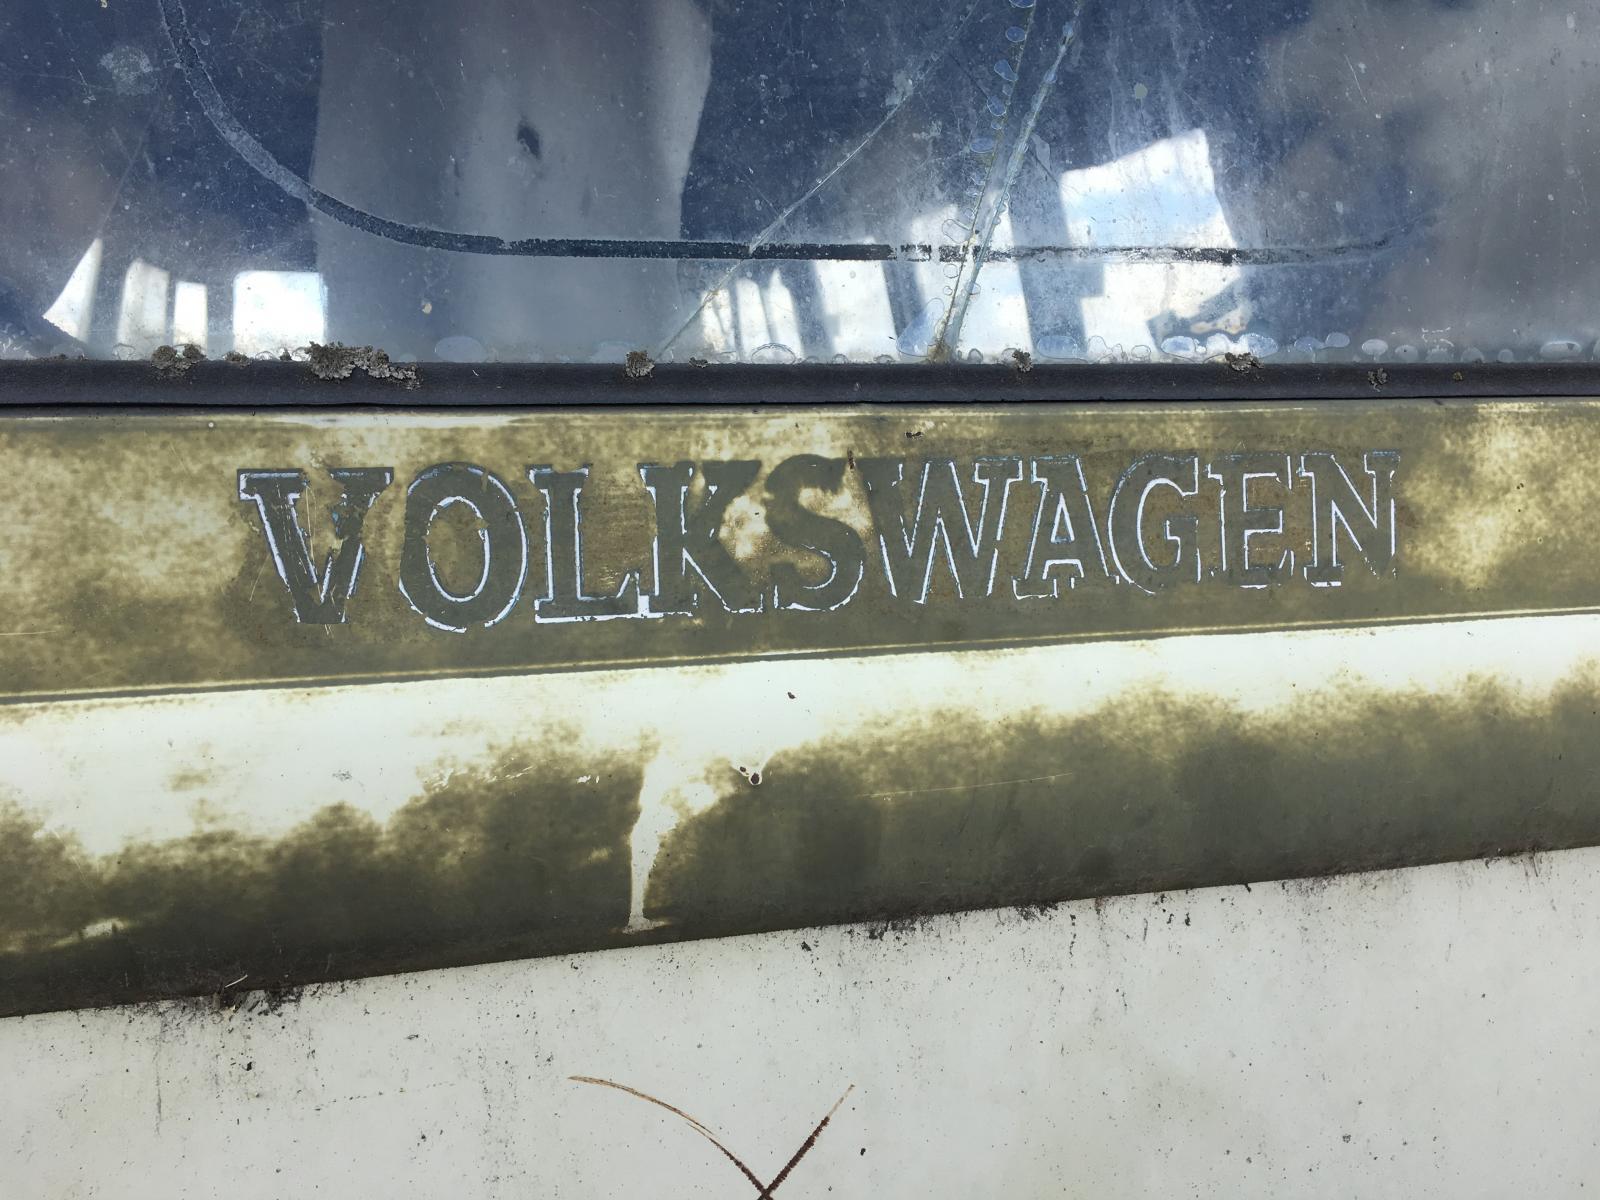 Canadian VW badging